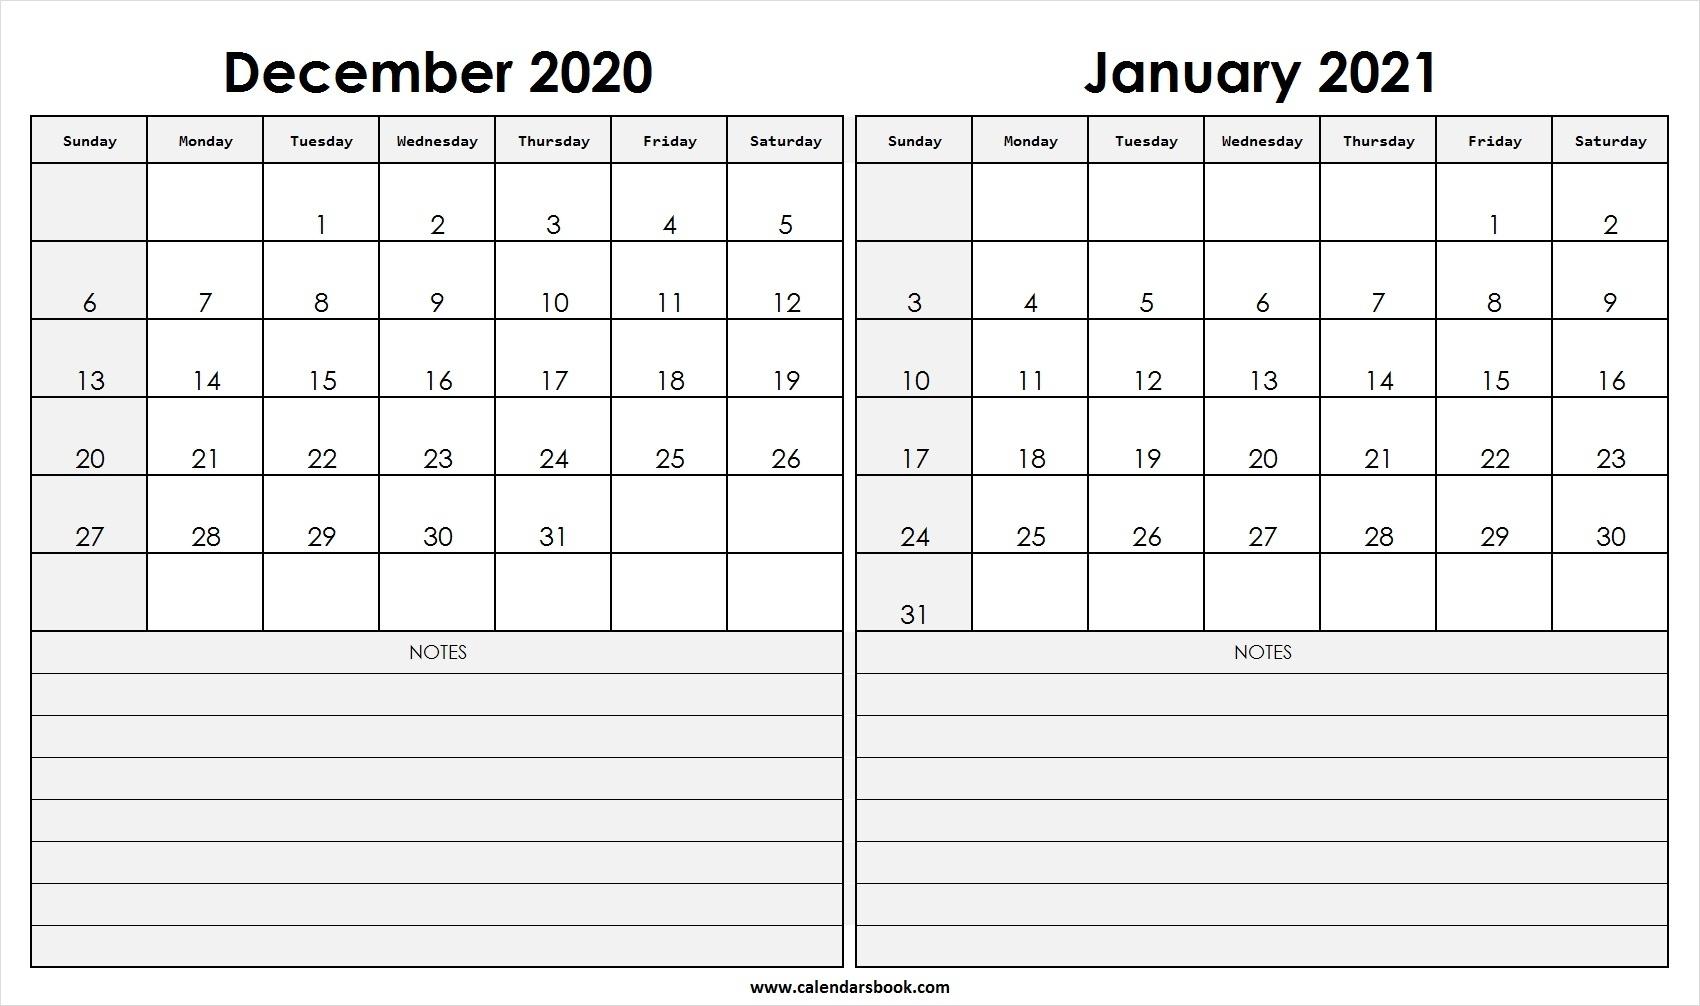 2021 Calendar December January 2020 | Avnitasoni December 2020 And Jan 2021 Calendar